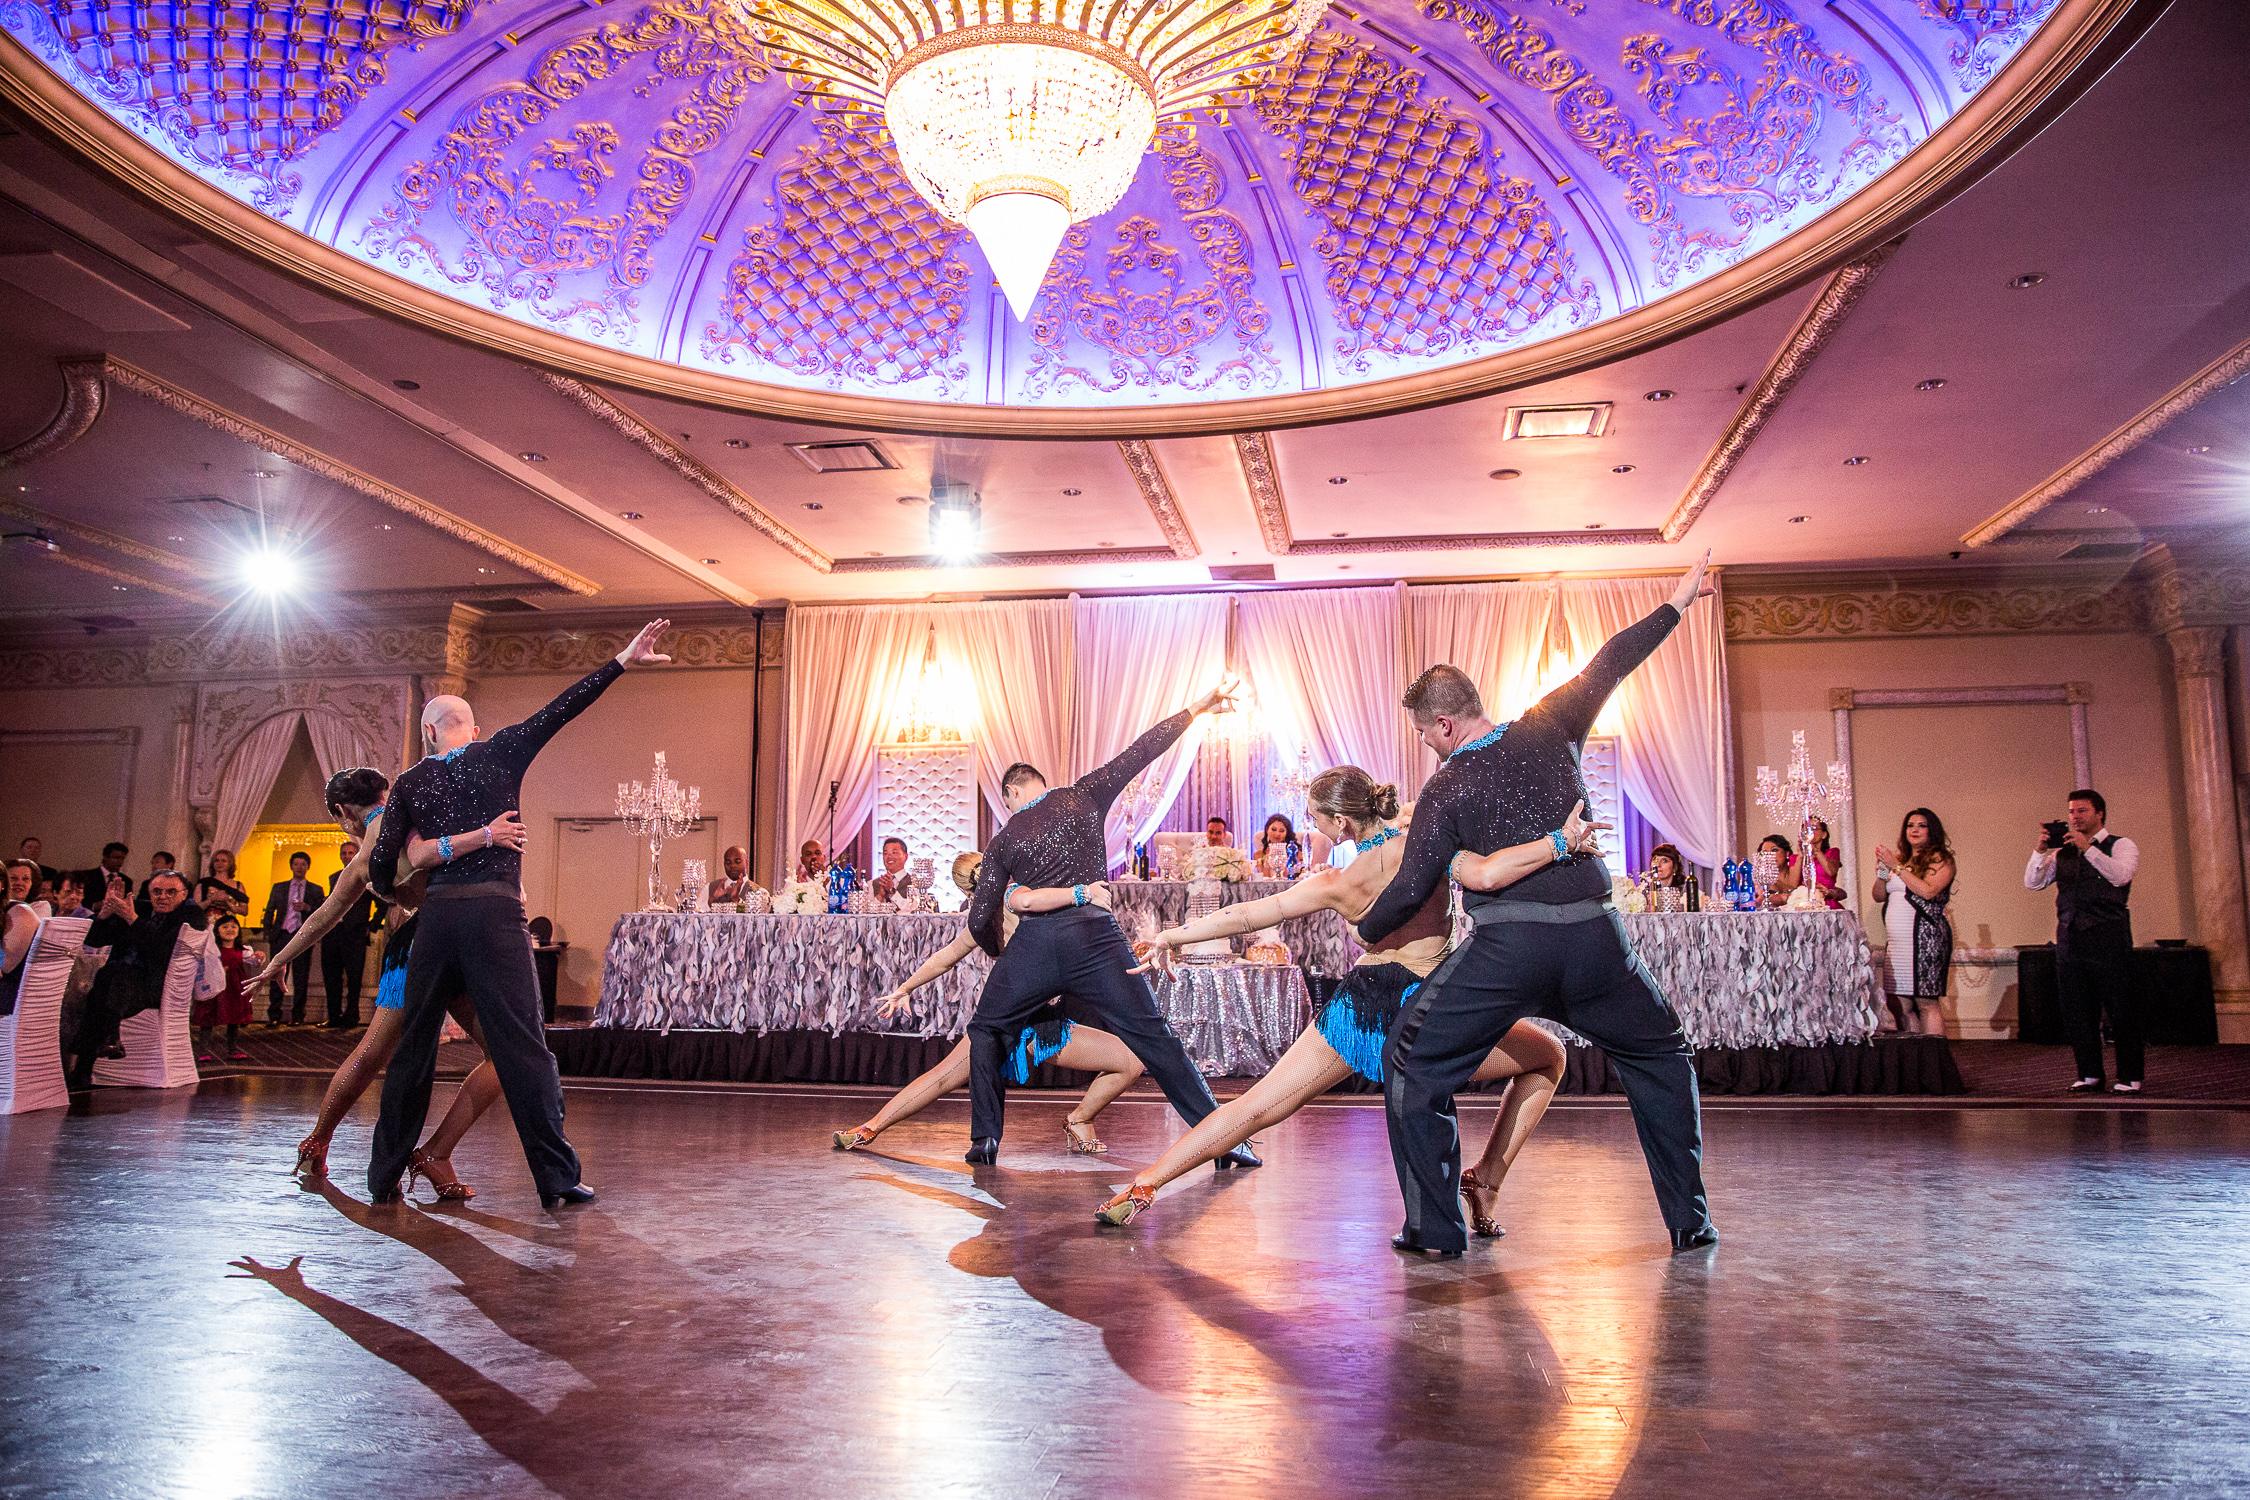 Paradise-Banquet-Hall-Wedding-Vaughan-Ontario-0084.jpg